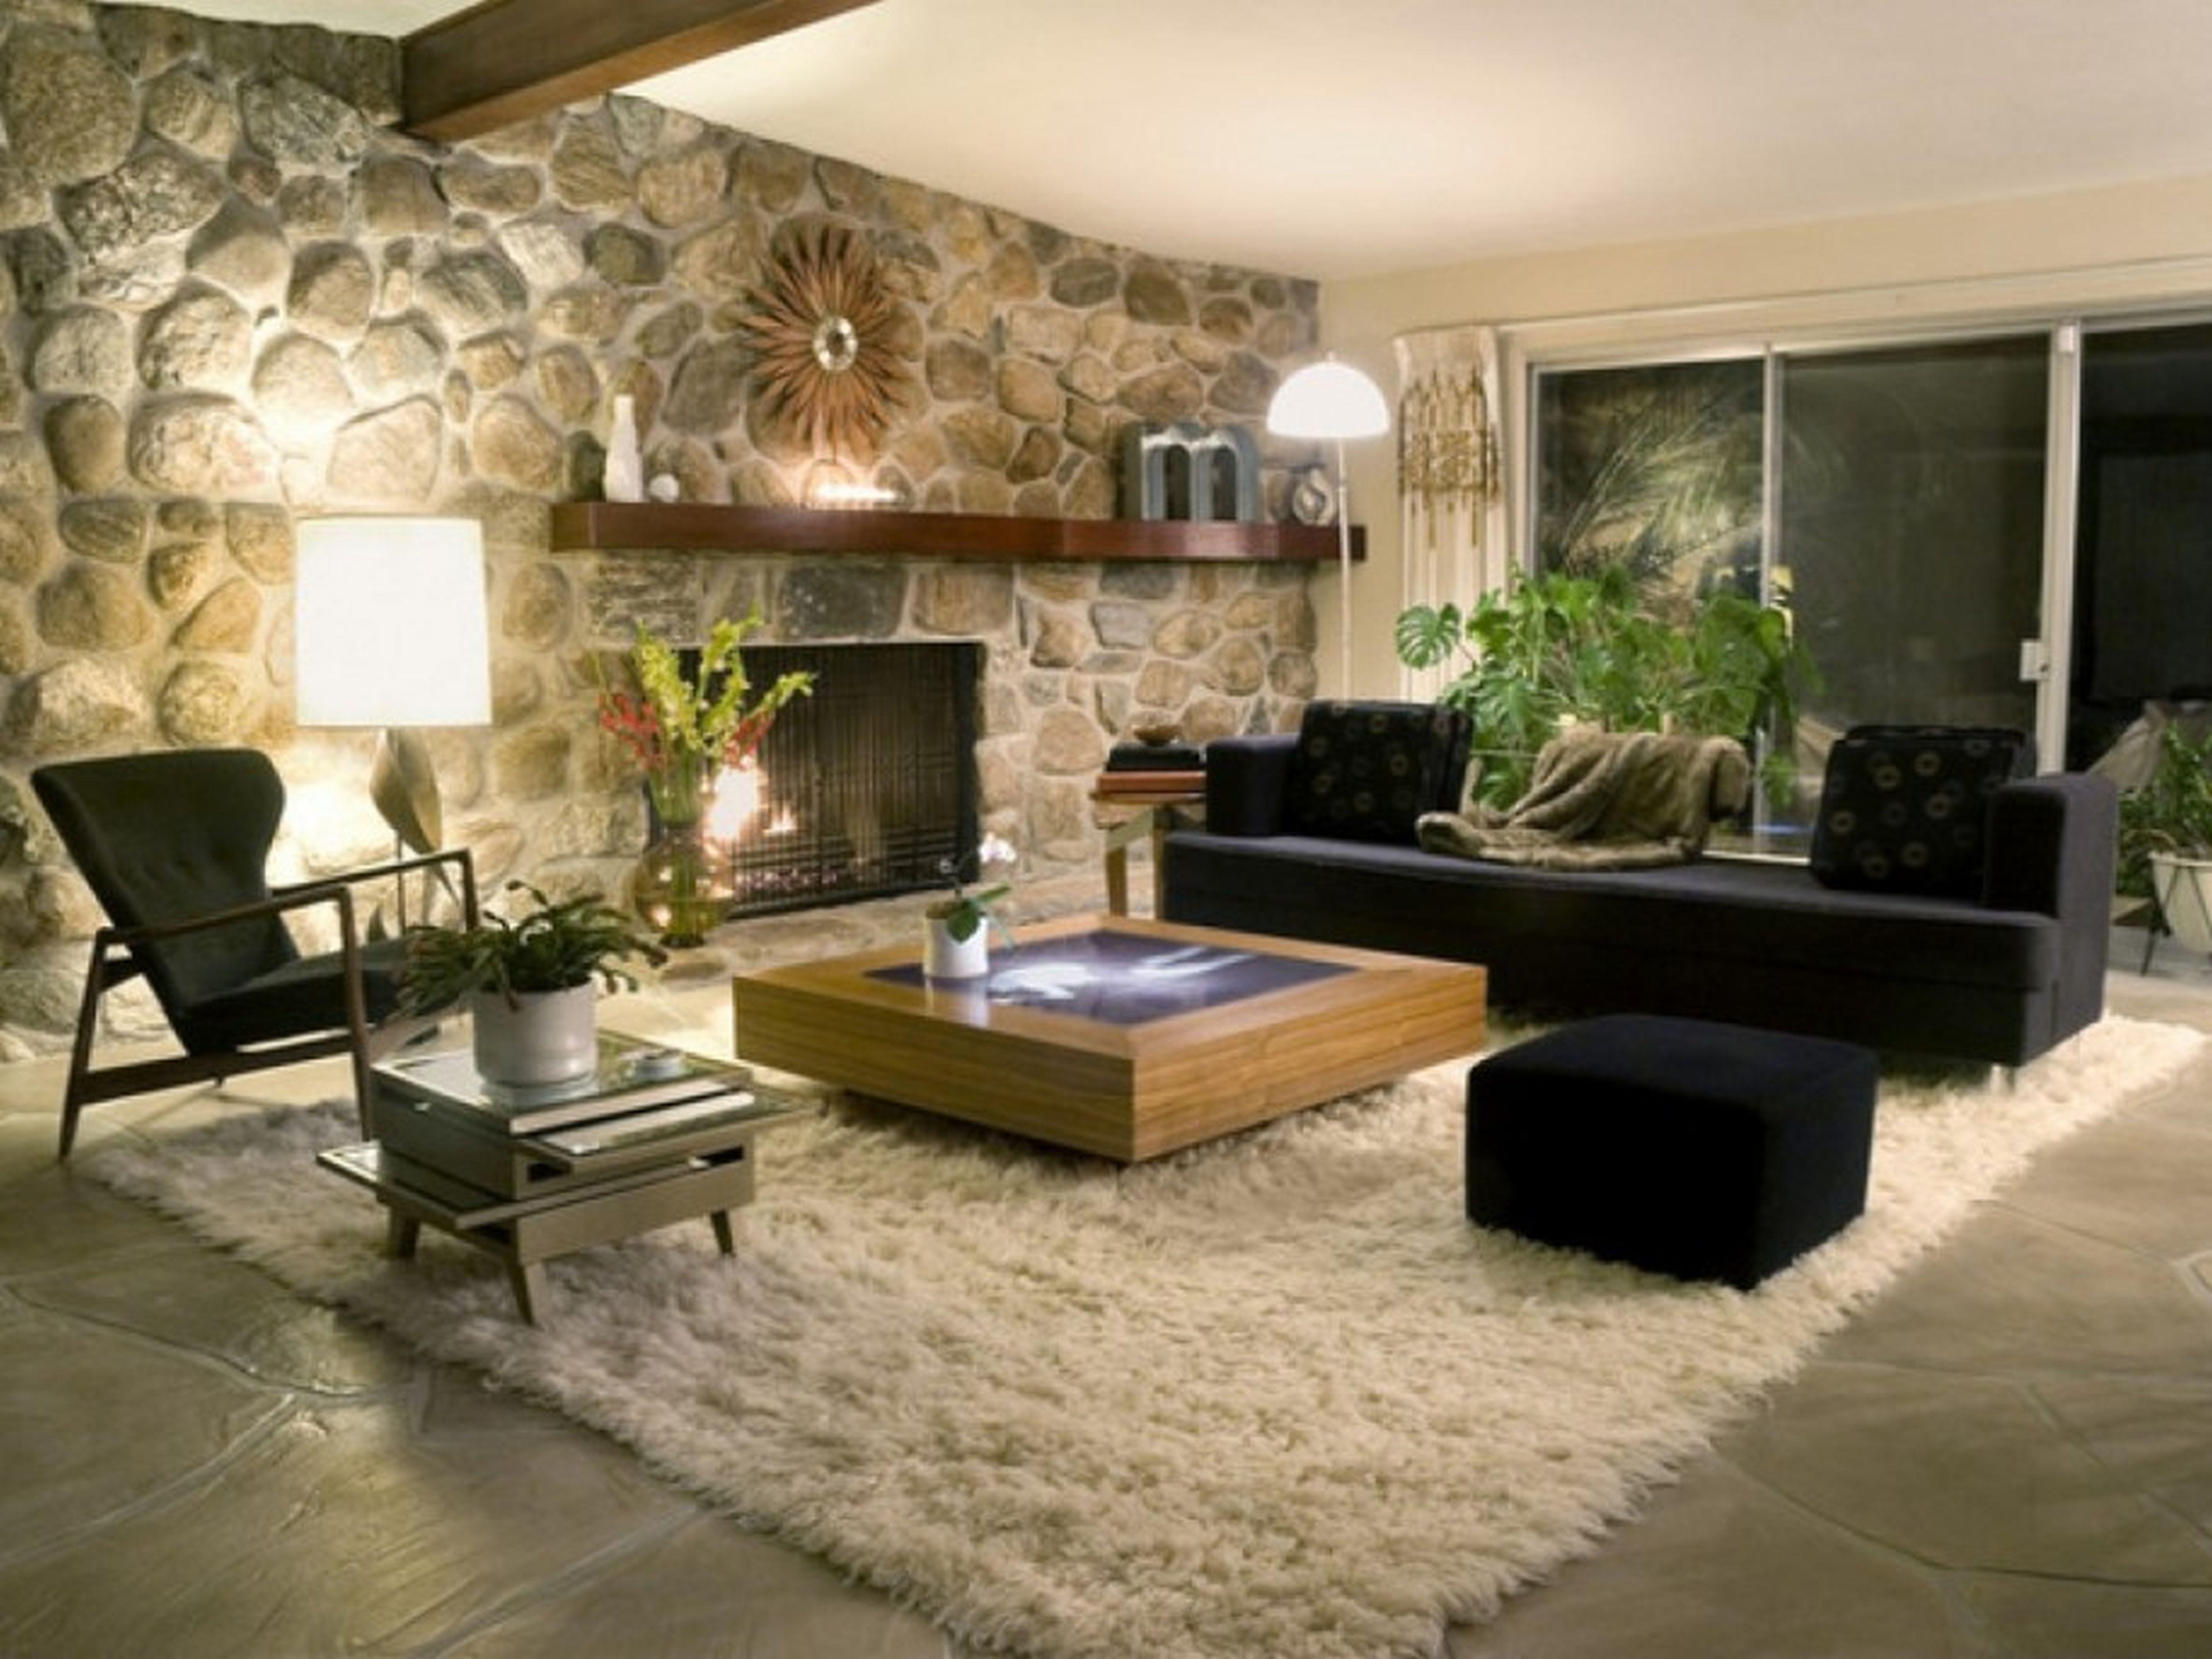 25 Modern Living Room Decor Ideas - The WoW Style